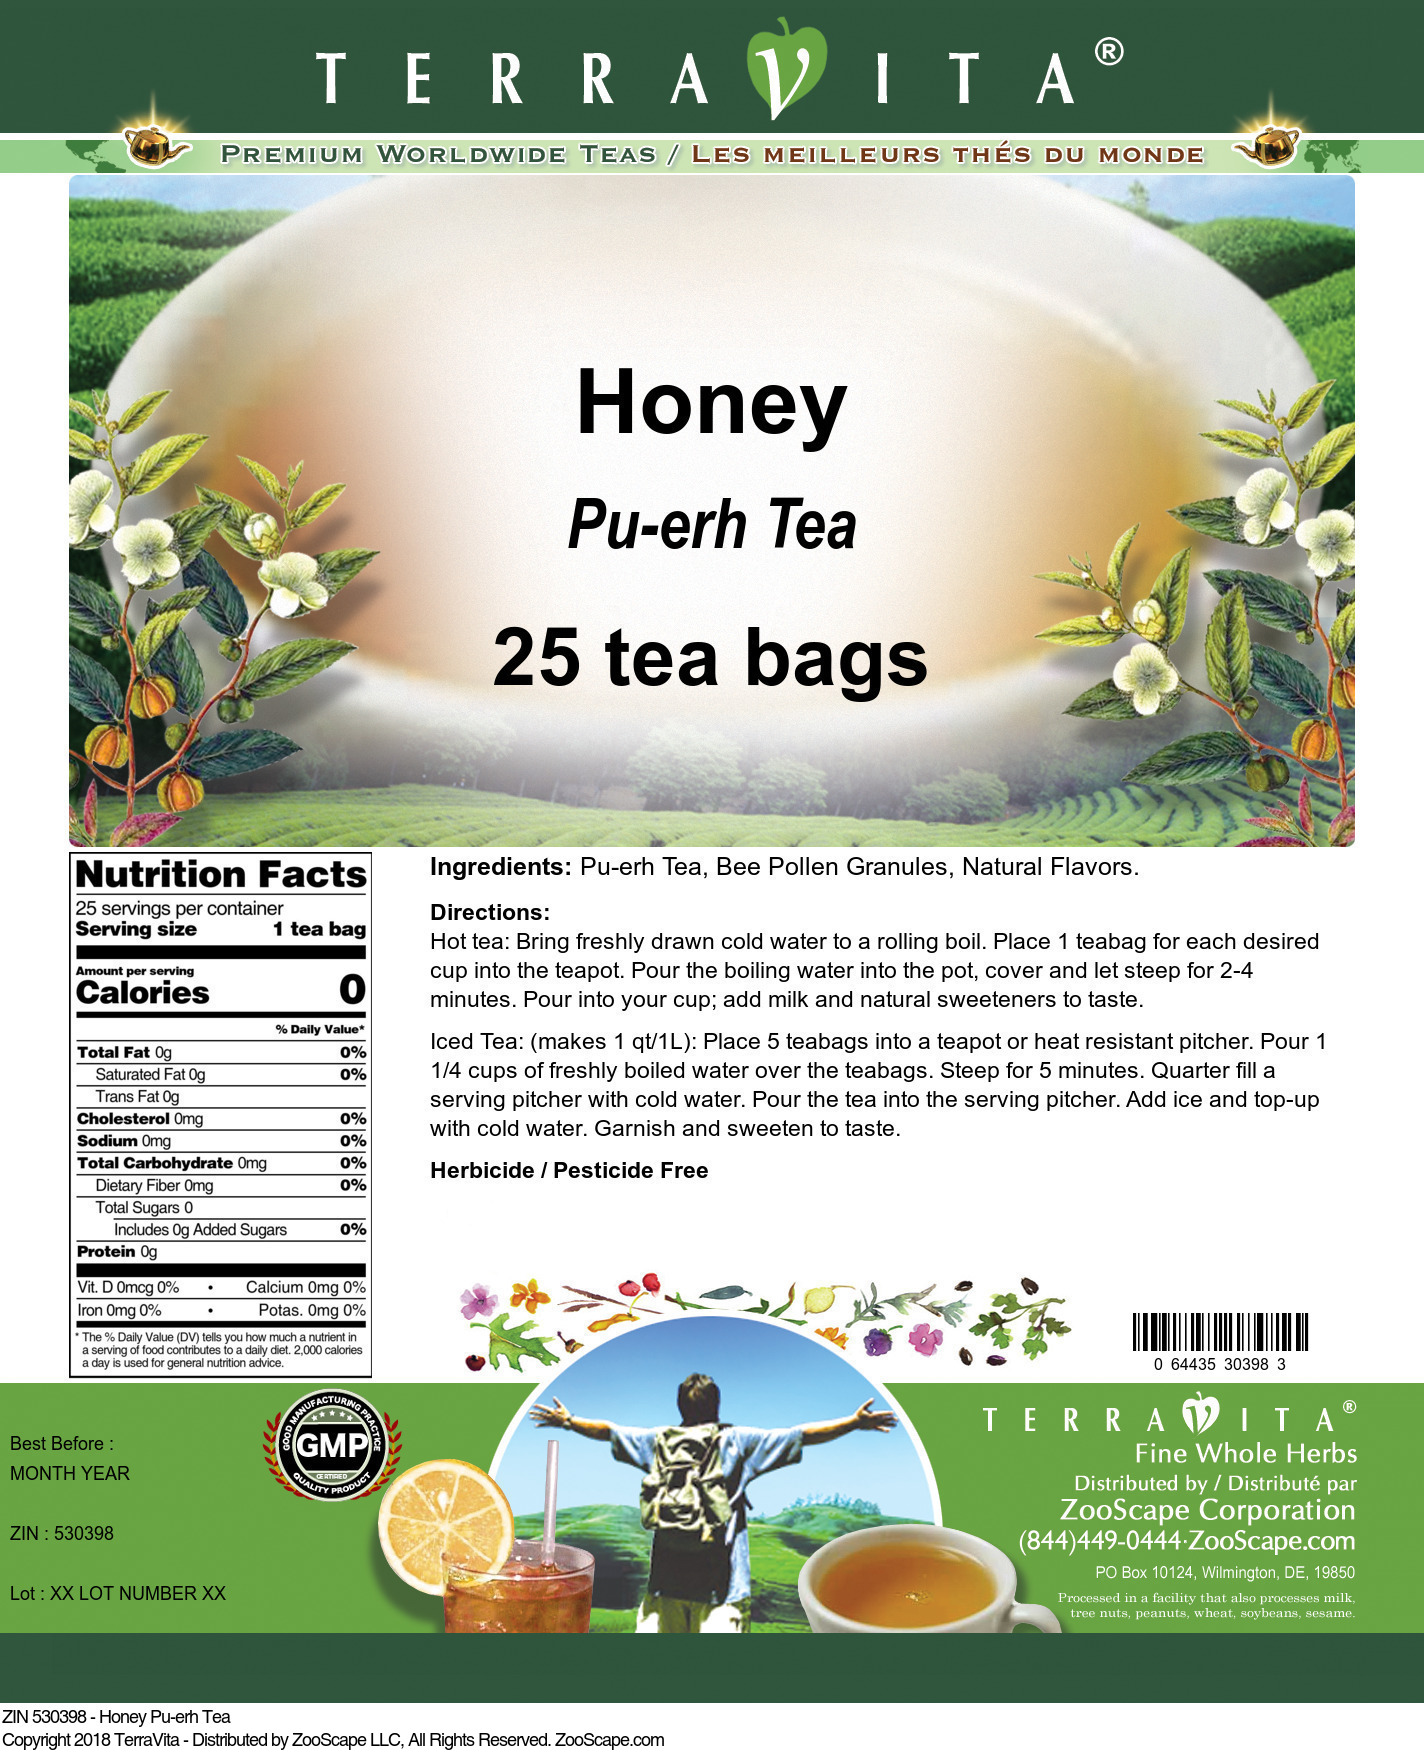 Honey Pu-erh Tea